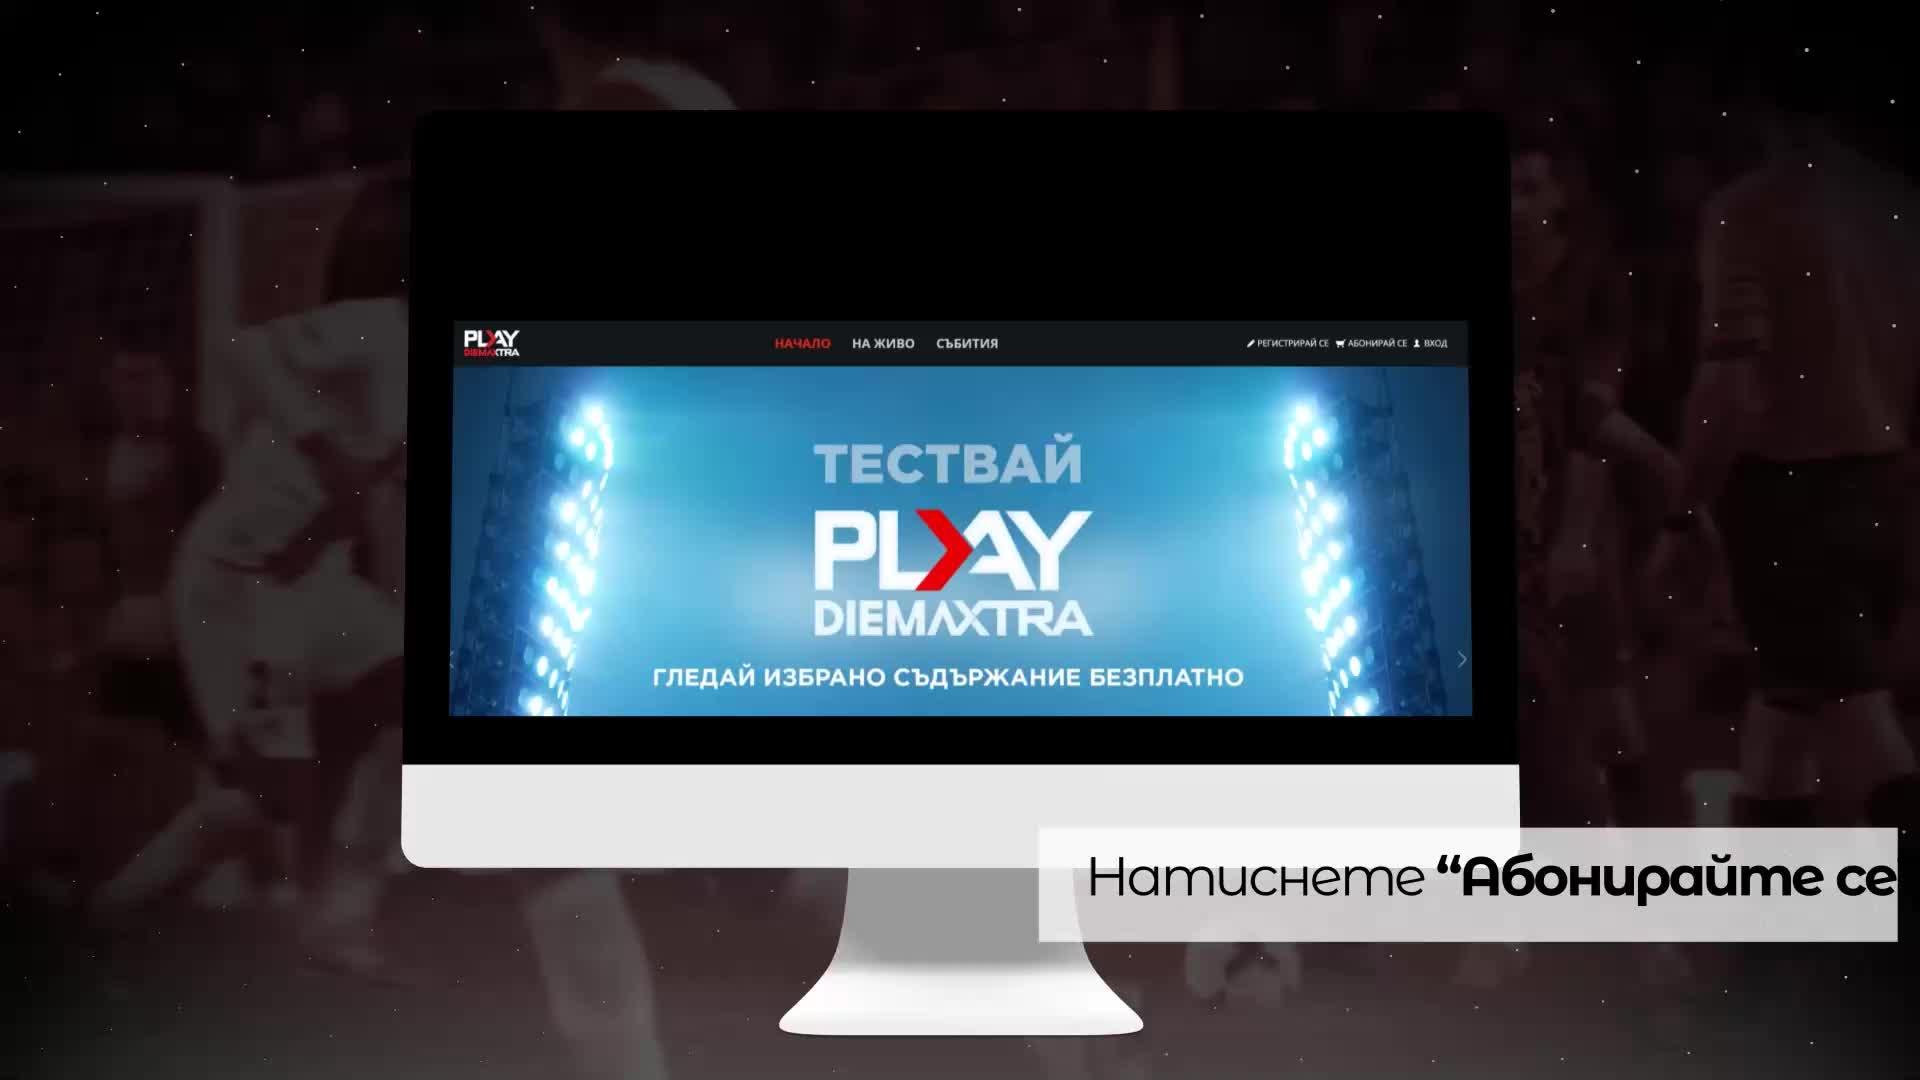 Play Diema Xtra - как да се абонирам